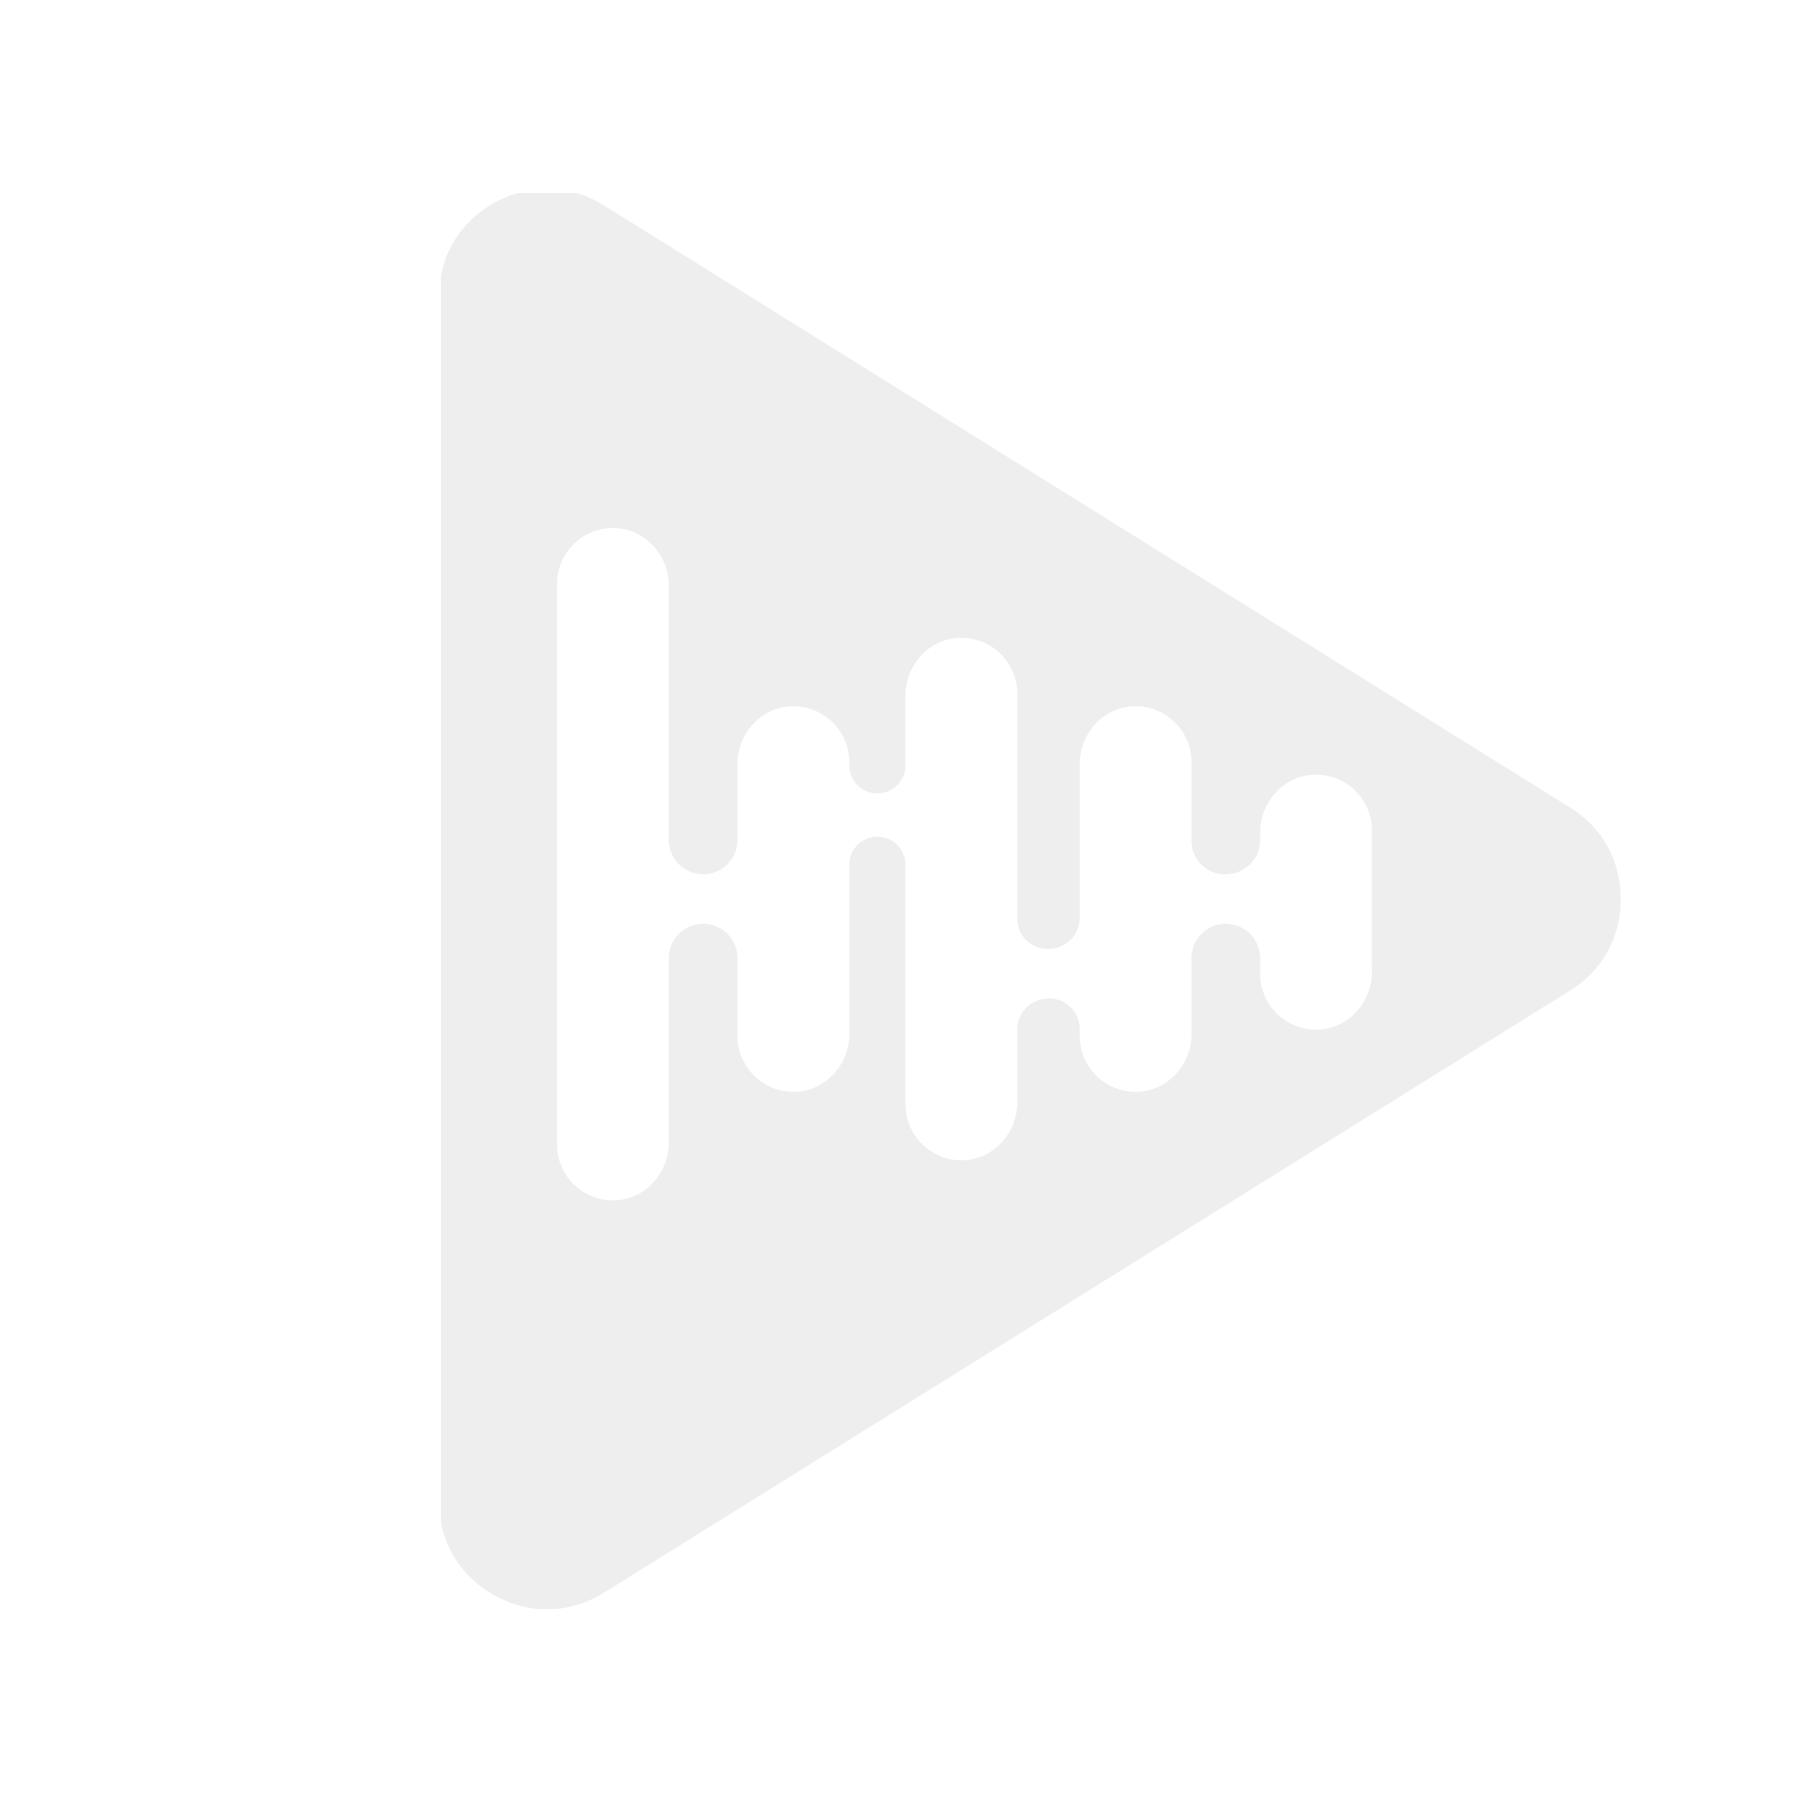 Metra 993043 - Radioadapter, 1-DIN, GM